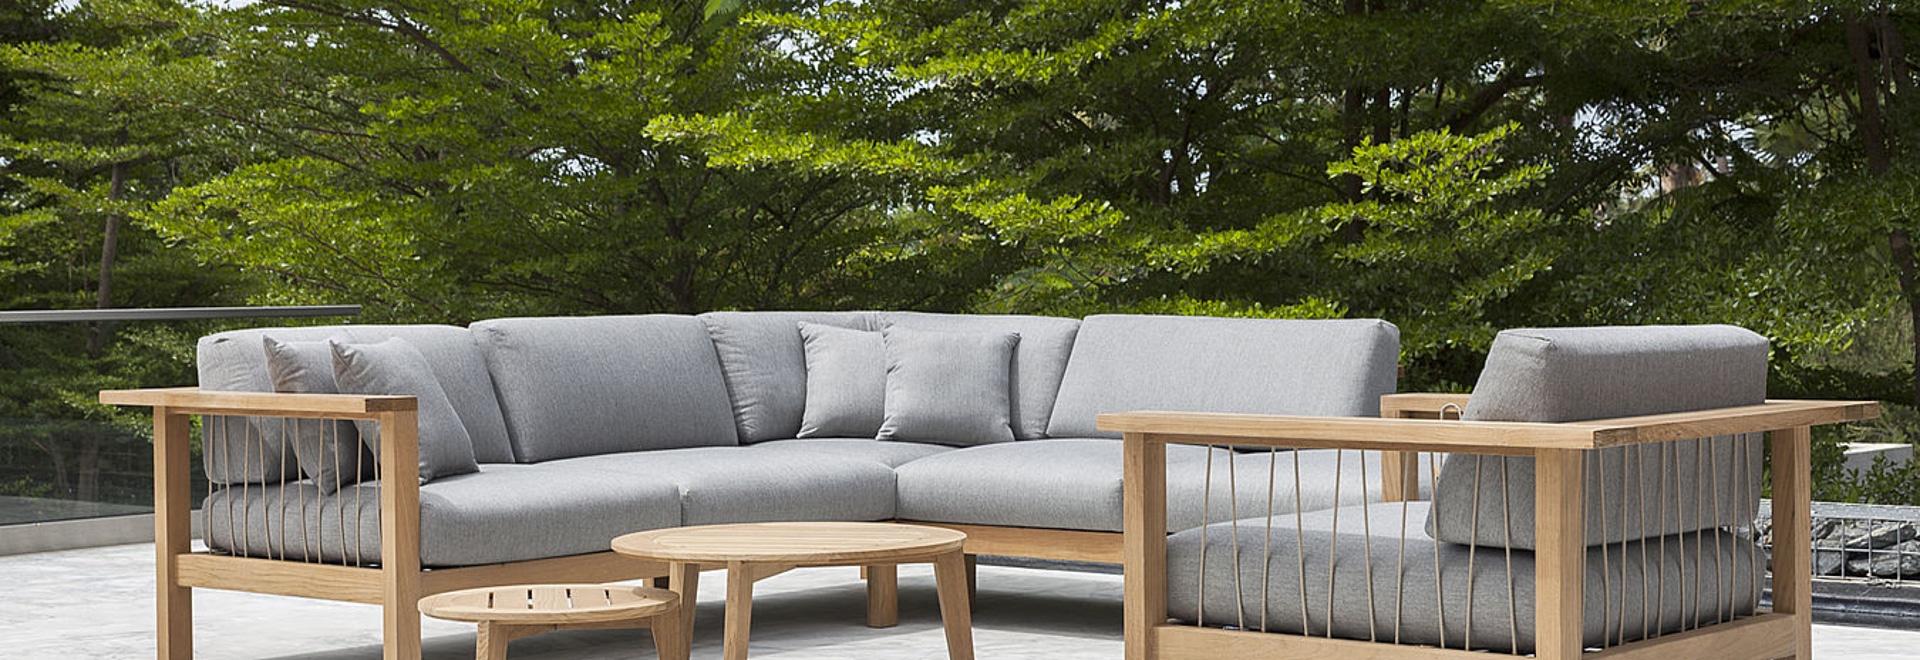 Teak lounge furniture with handwoven ropes - OASIQ